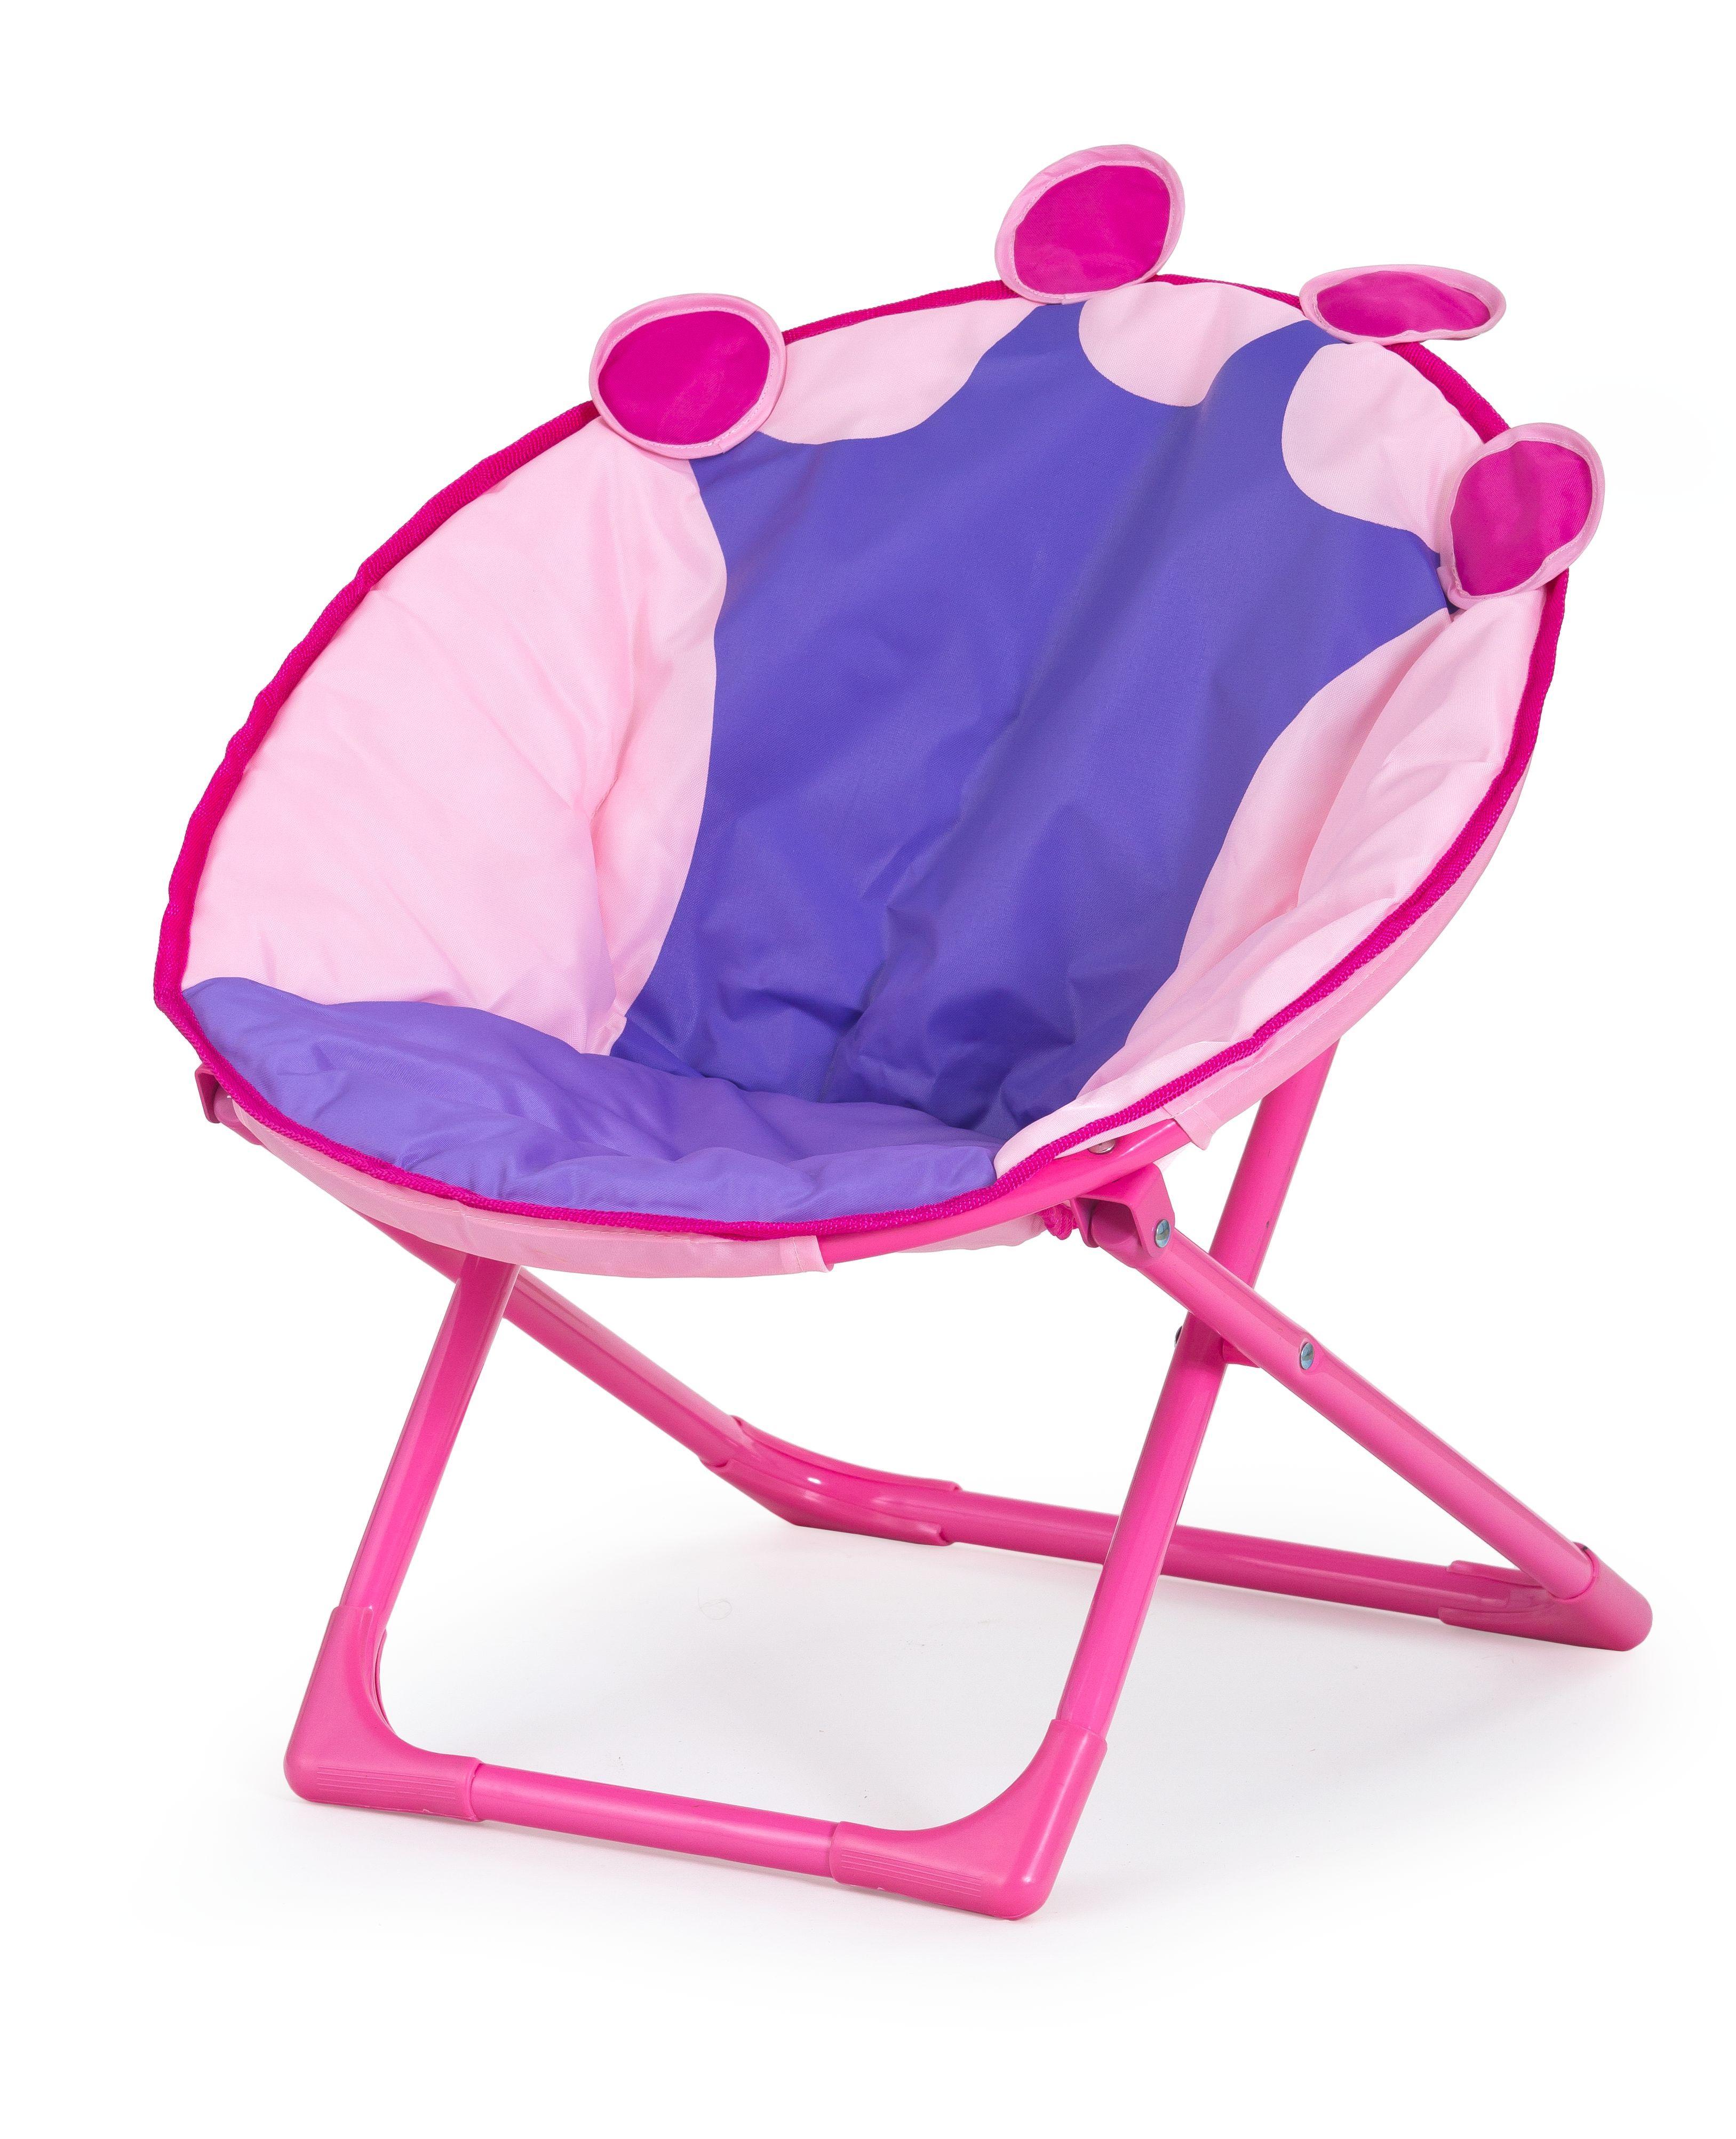 Vaikiškas fotelis QUEEN